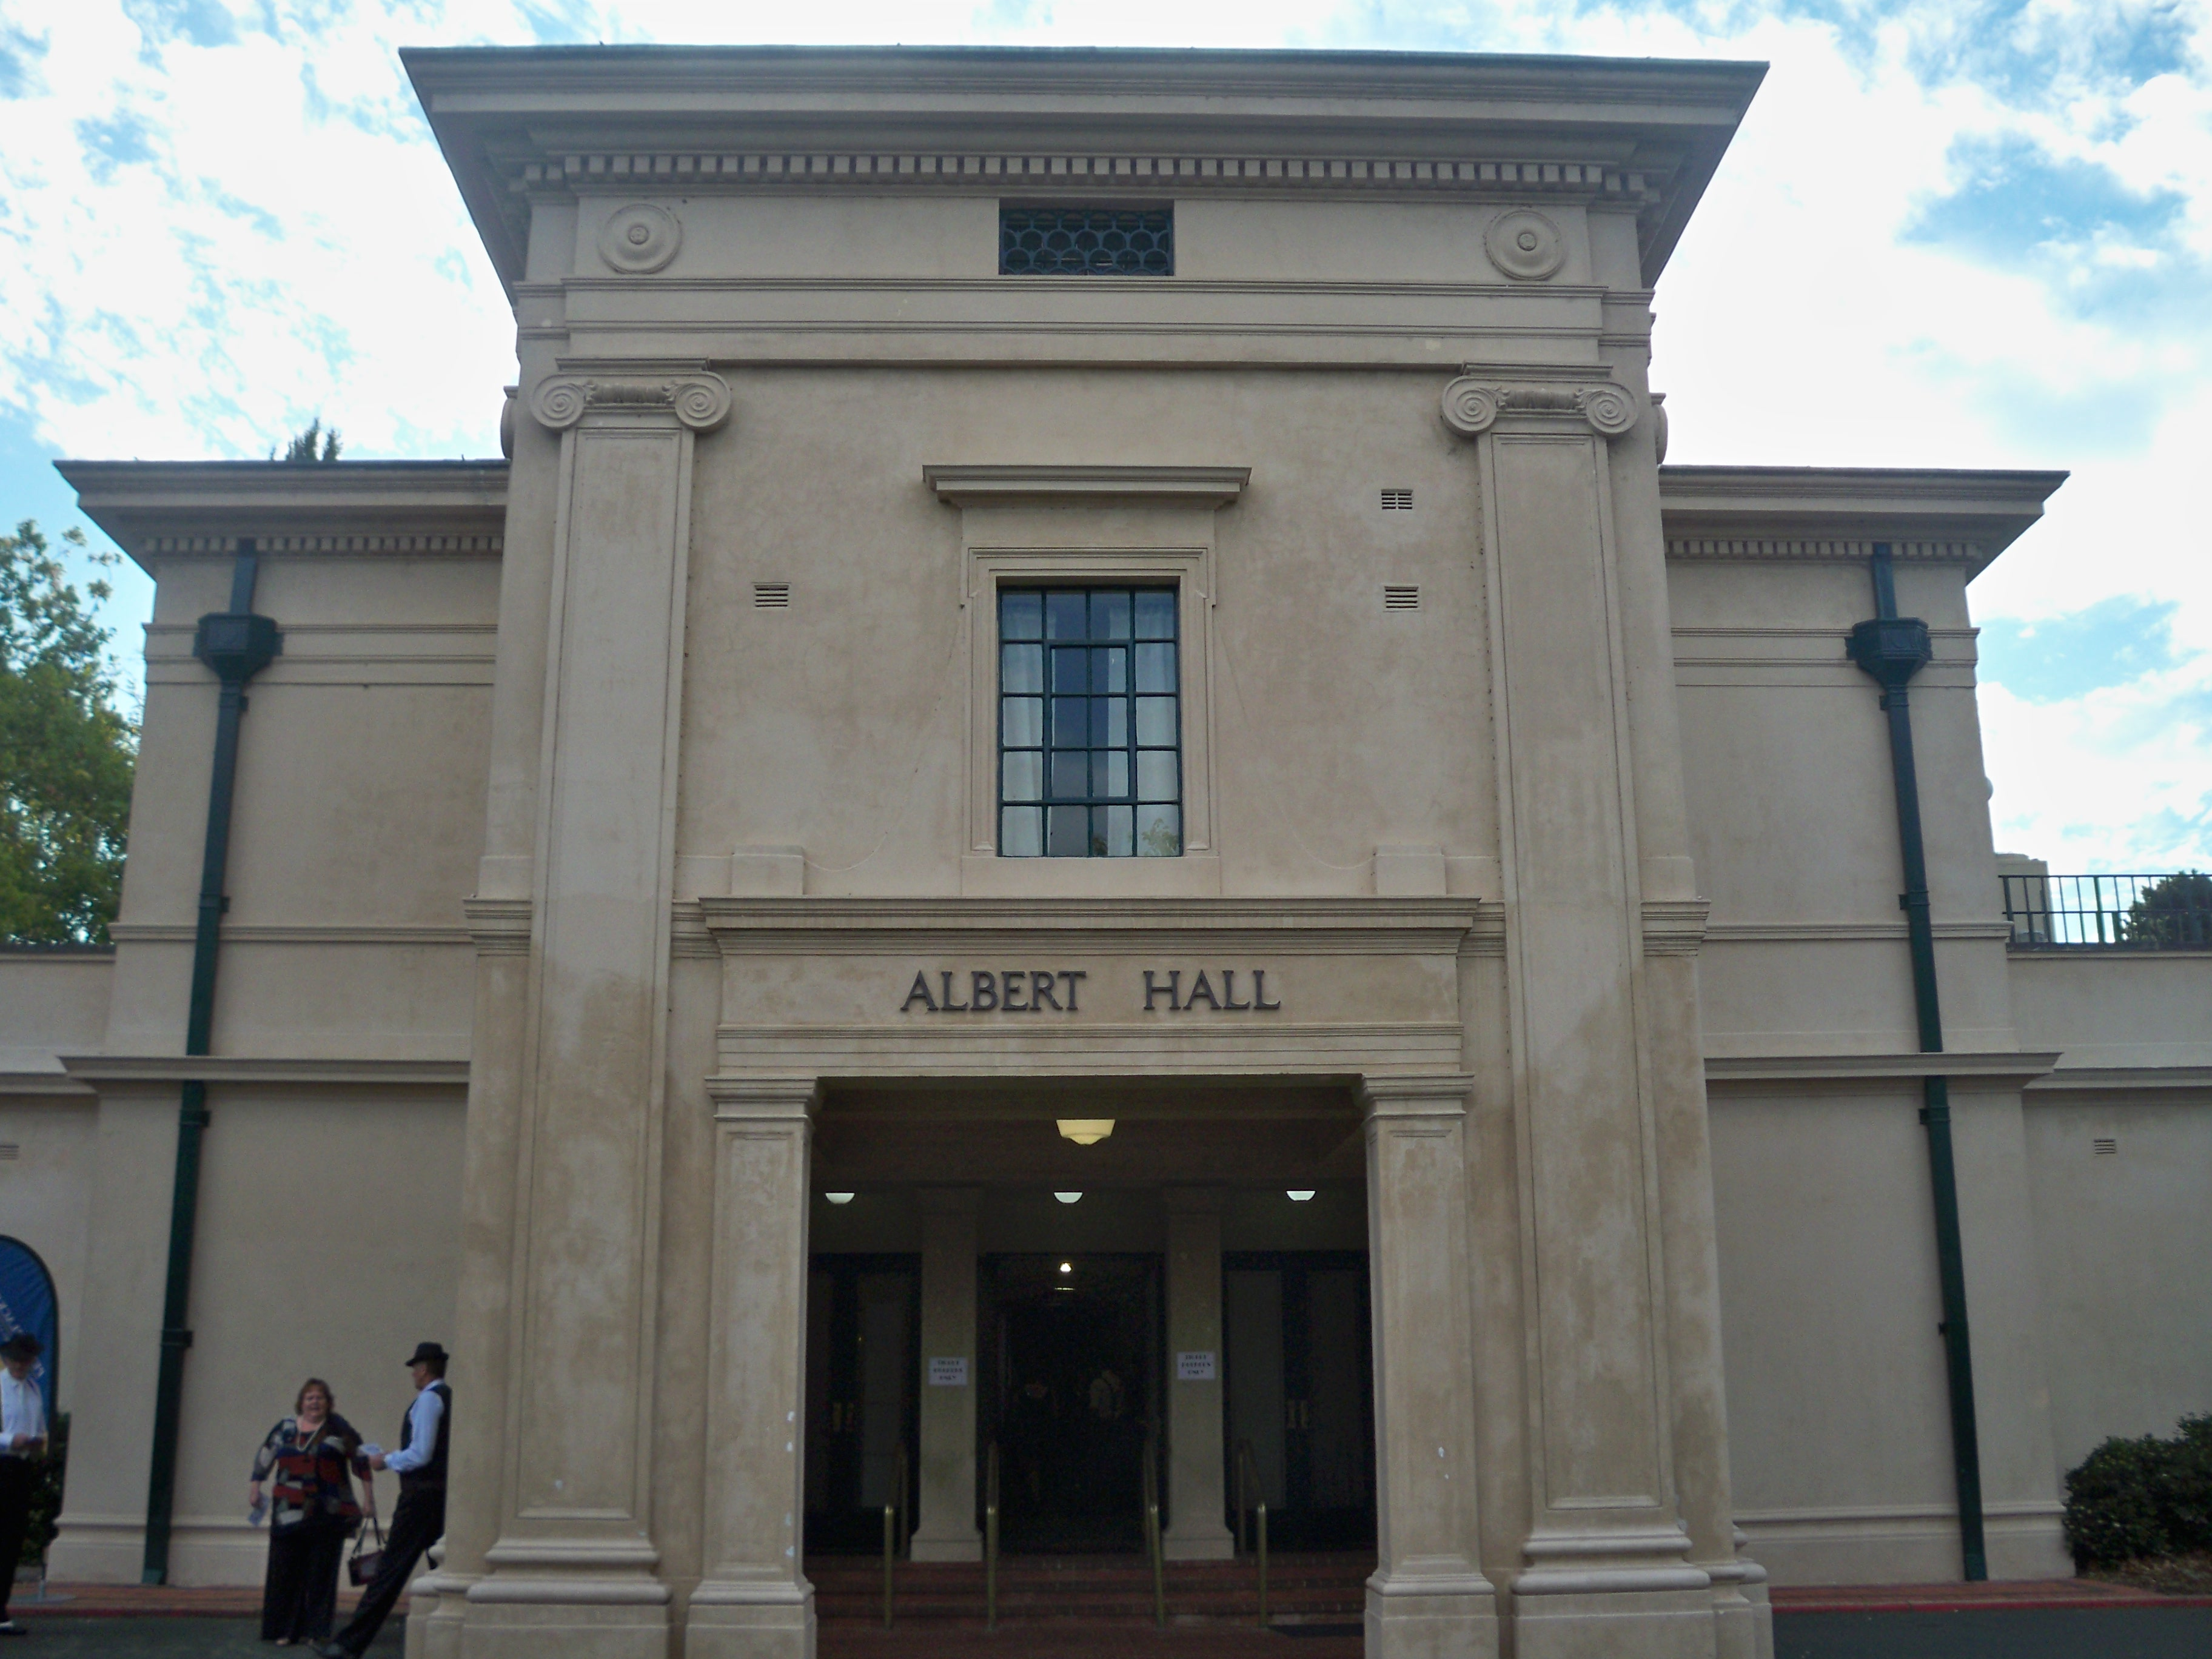 Albert Hall Front Entrance